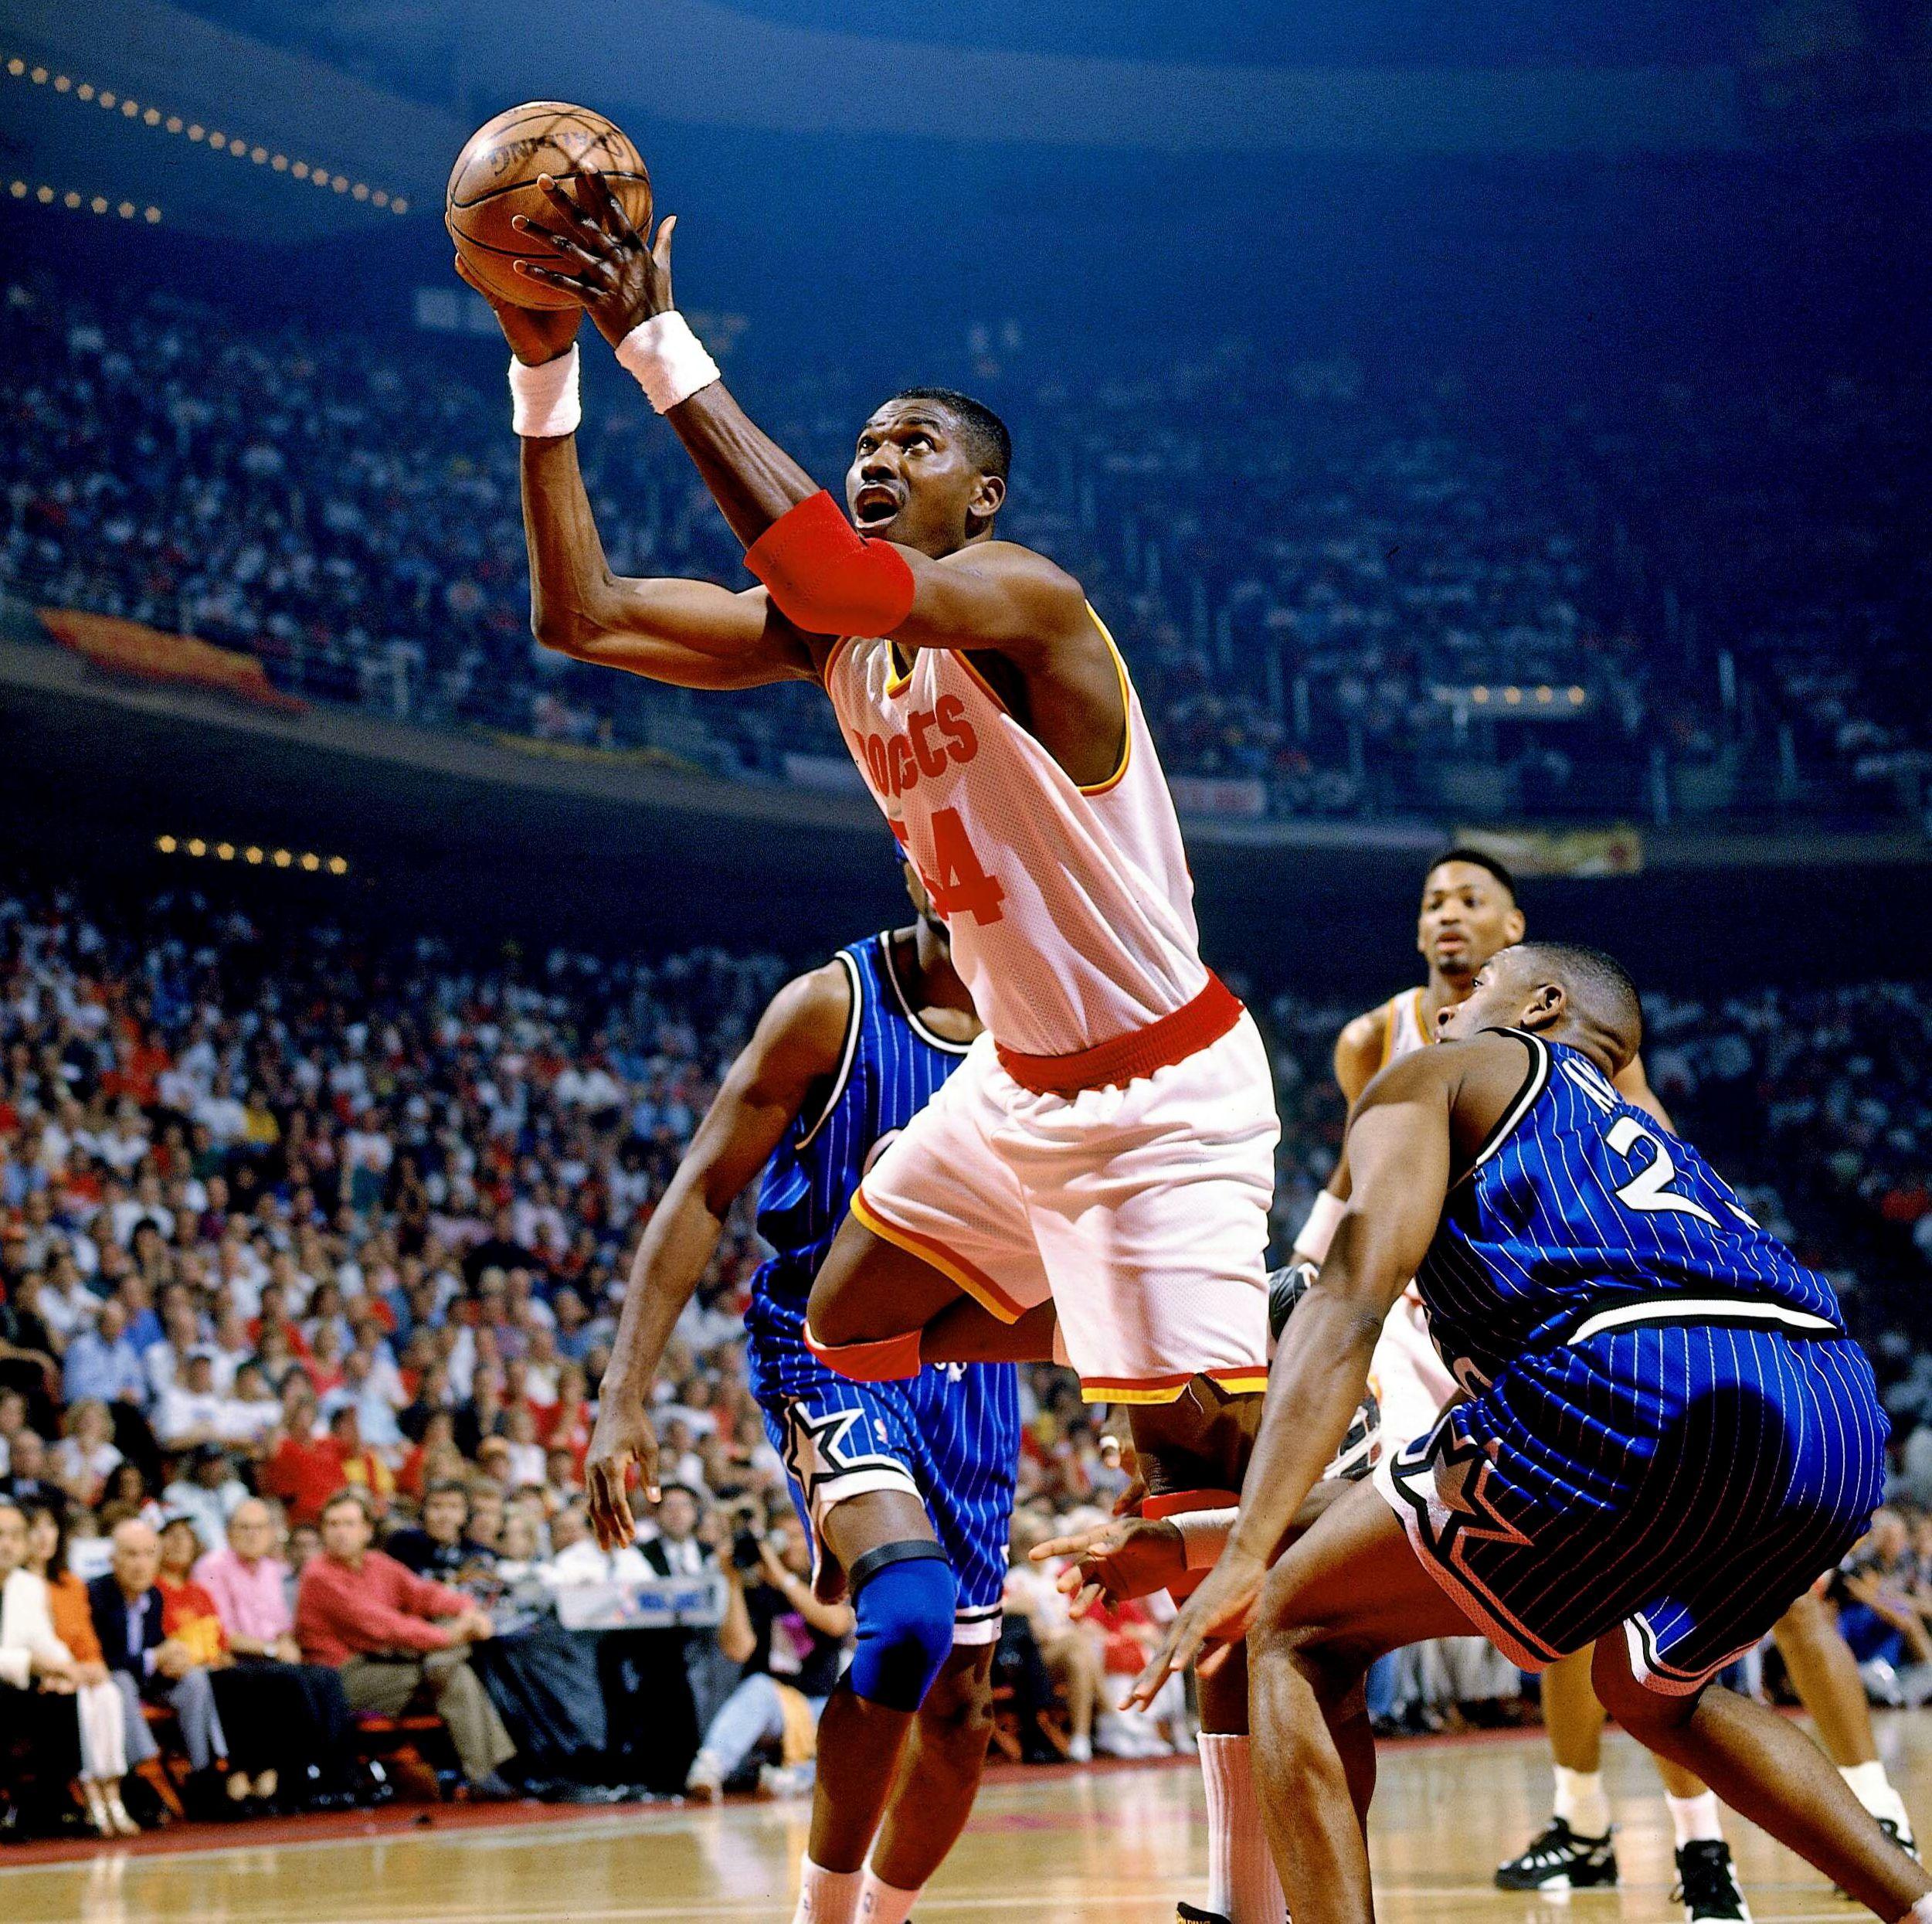 478fbb432f63a6 35. Blind Free Throw - Michael Jordan 50 Greatest Moments - ESPN